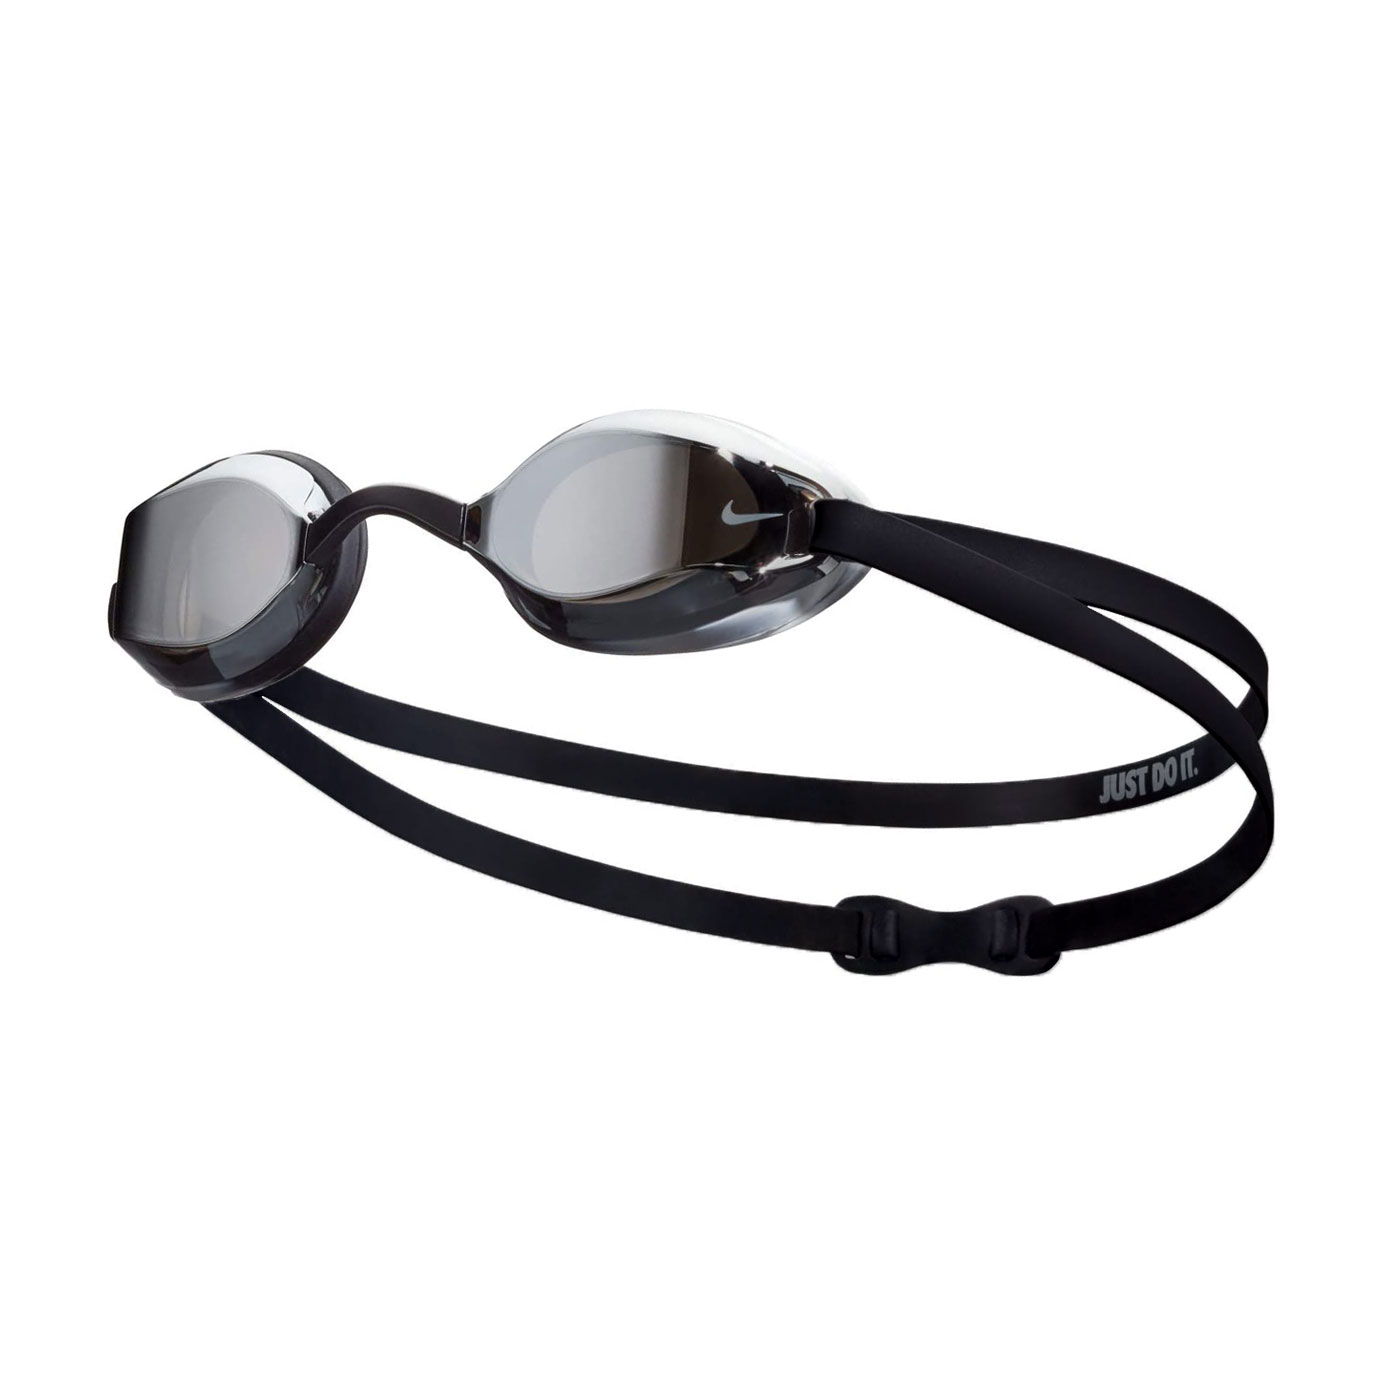 NIKE SWIM 兒童專業型泳鏡 NESSA180-040